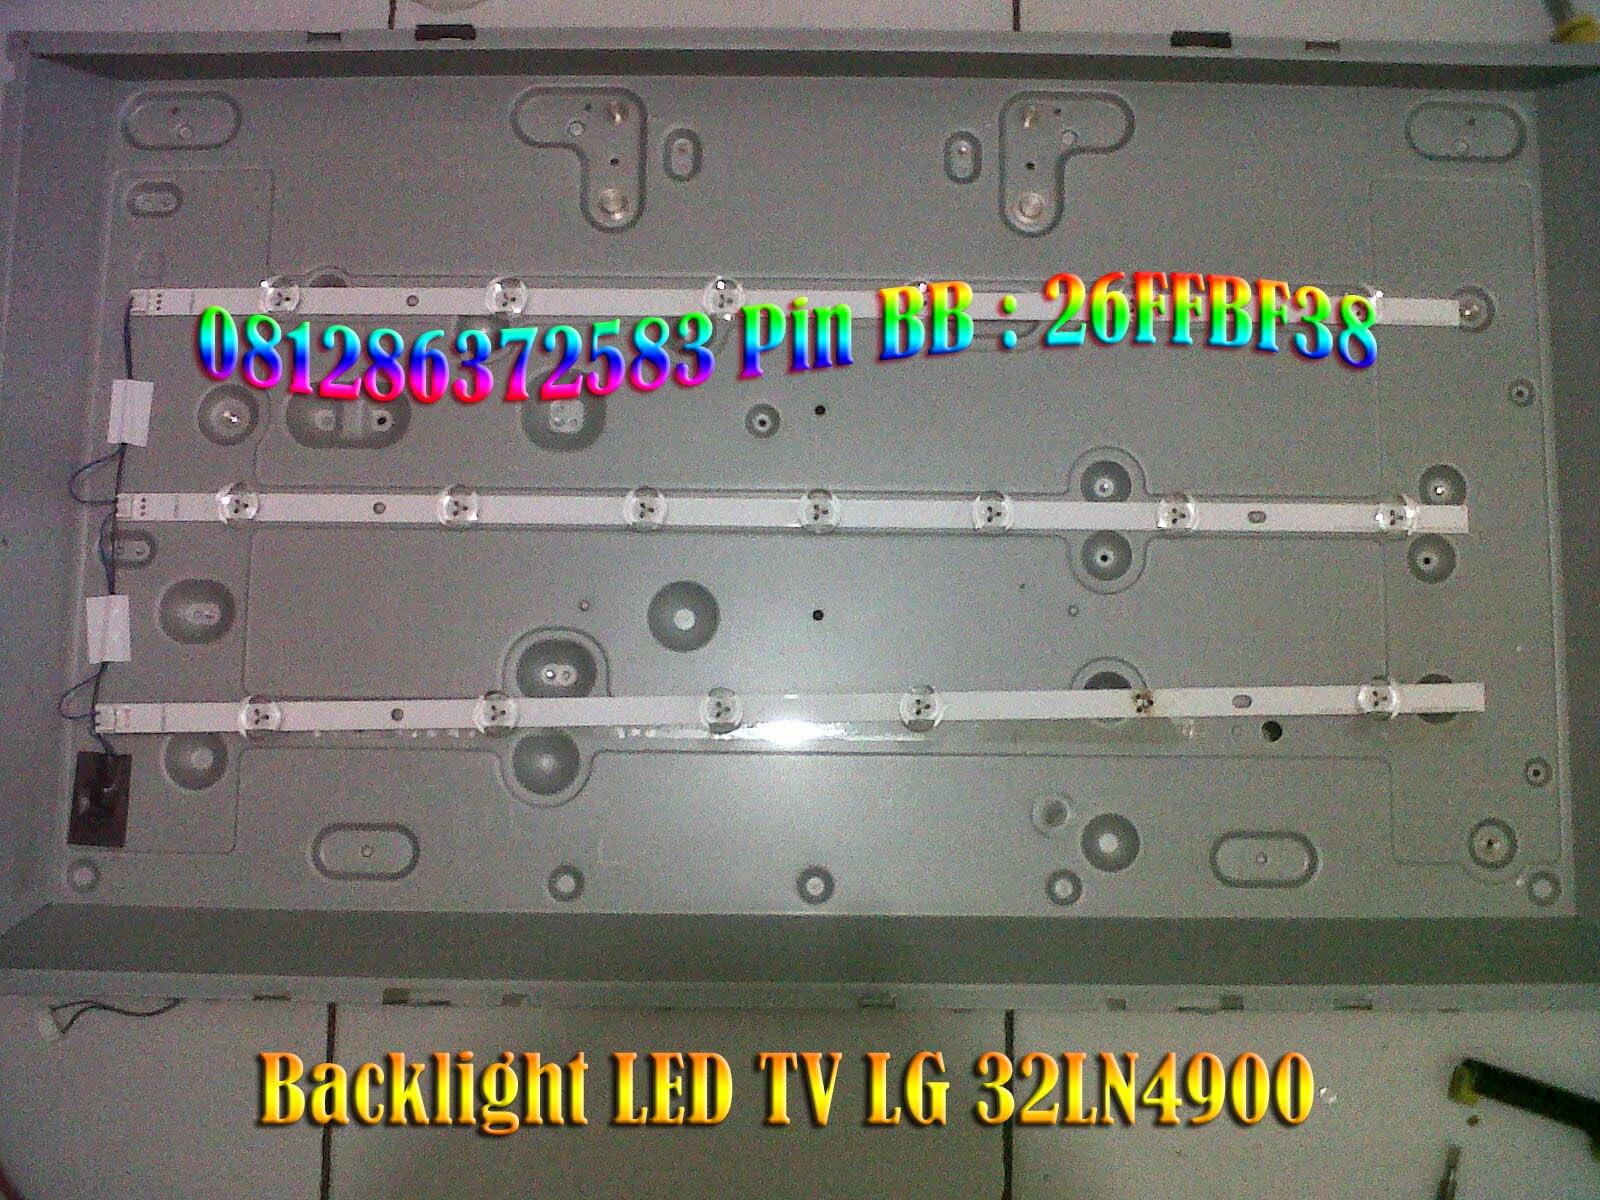 Backlight LED TV